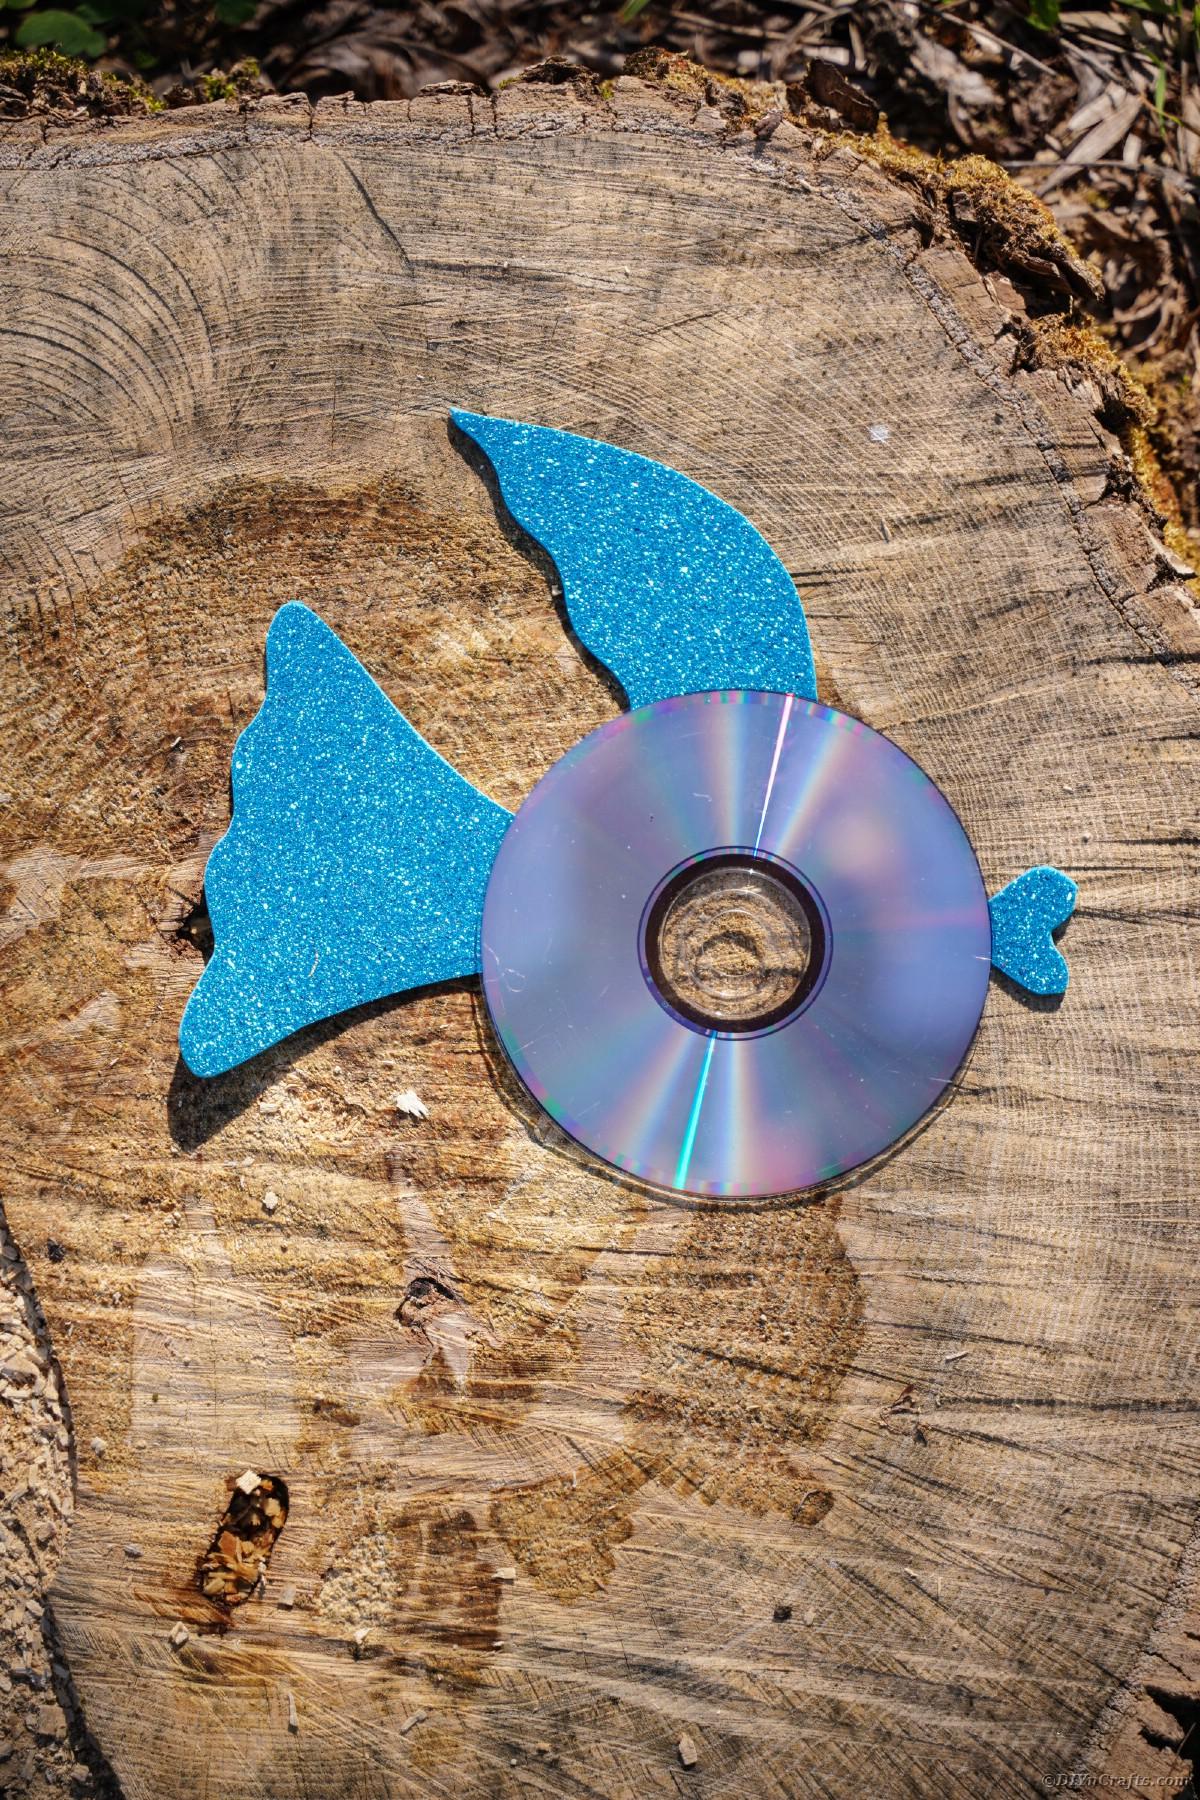 Blue fin CD fish on wood slice